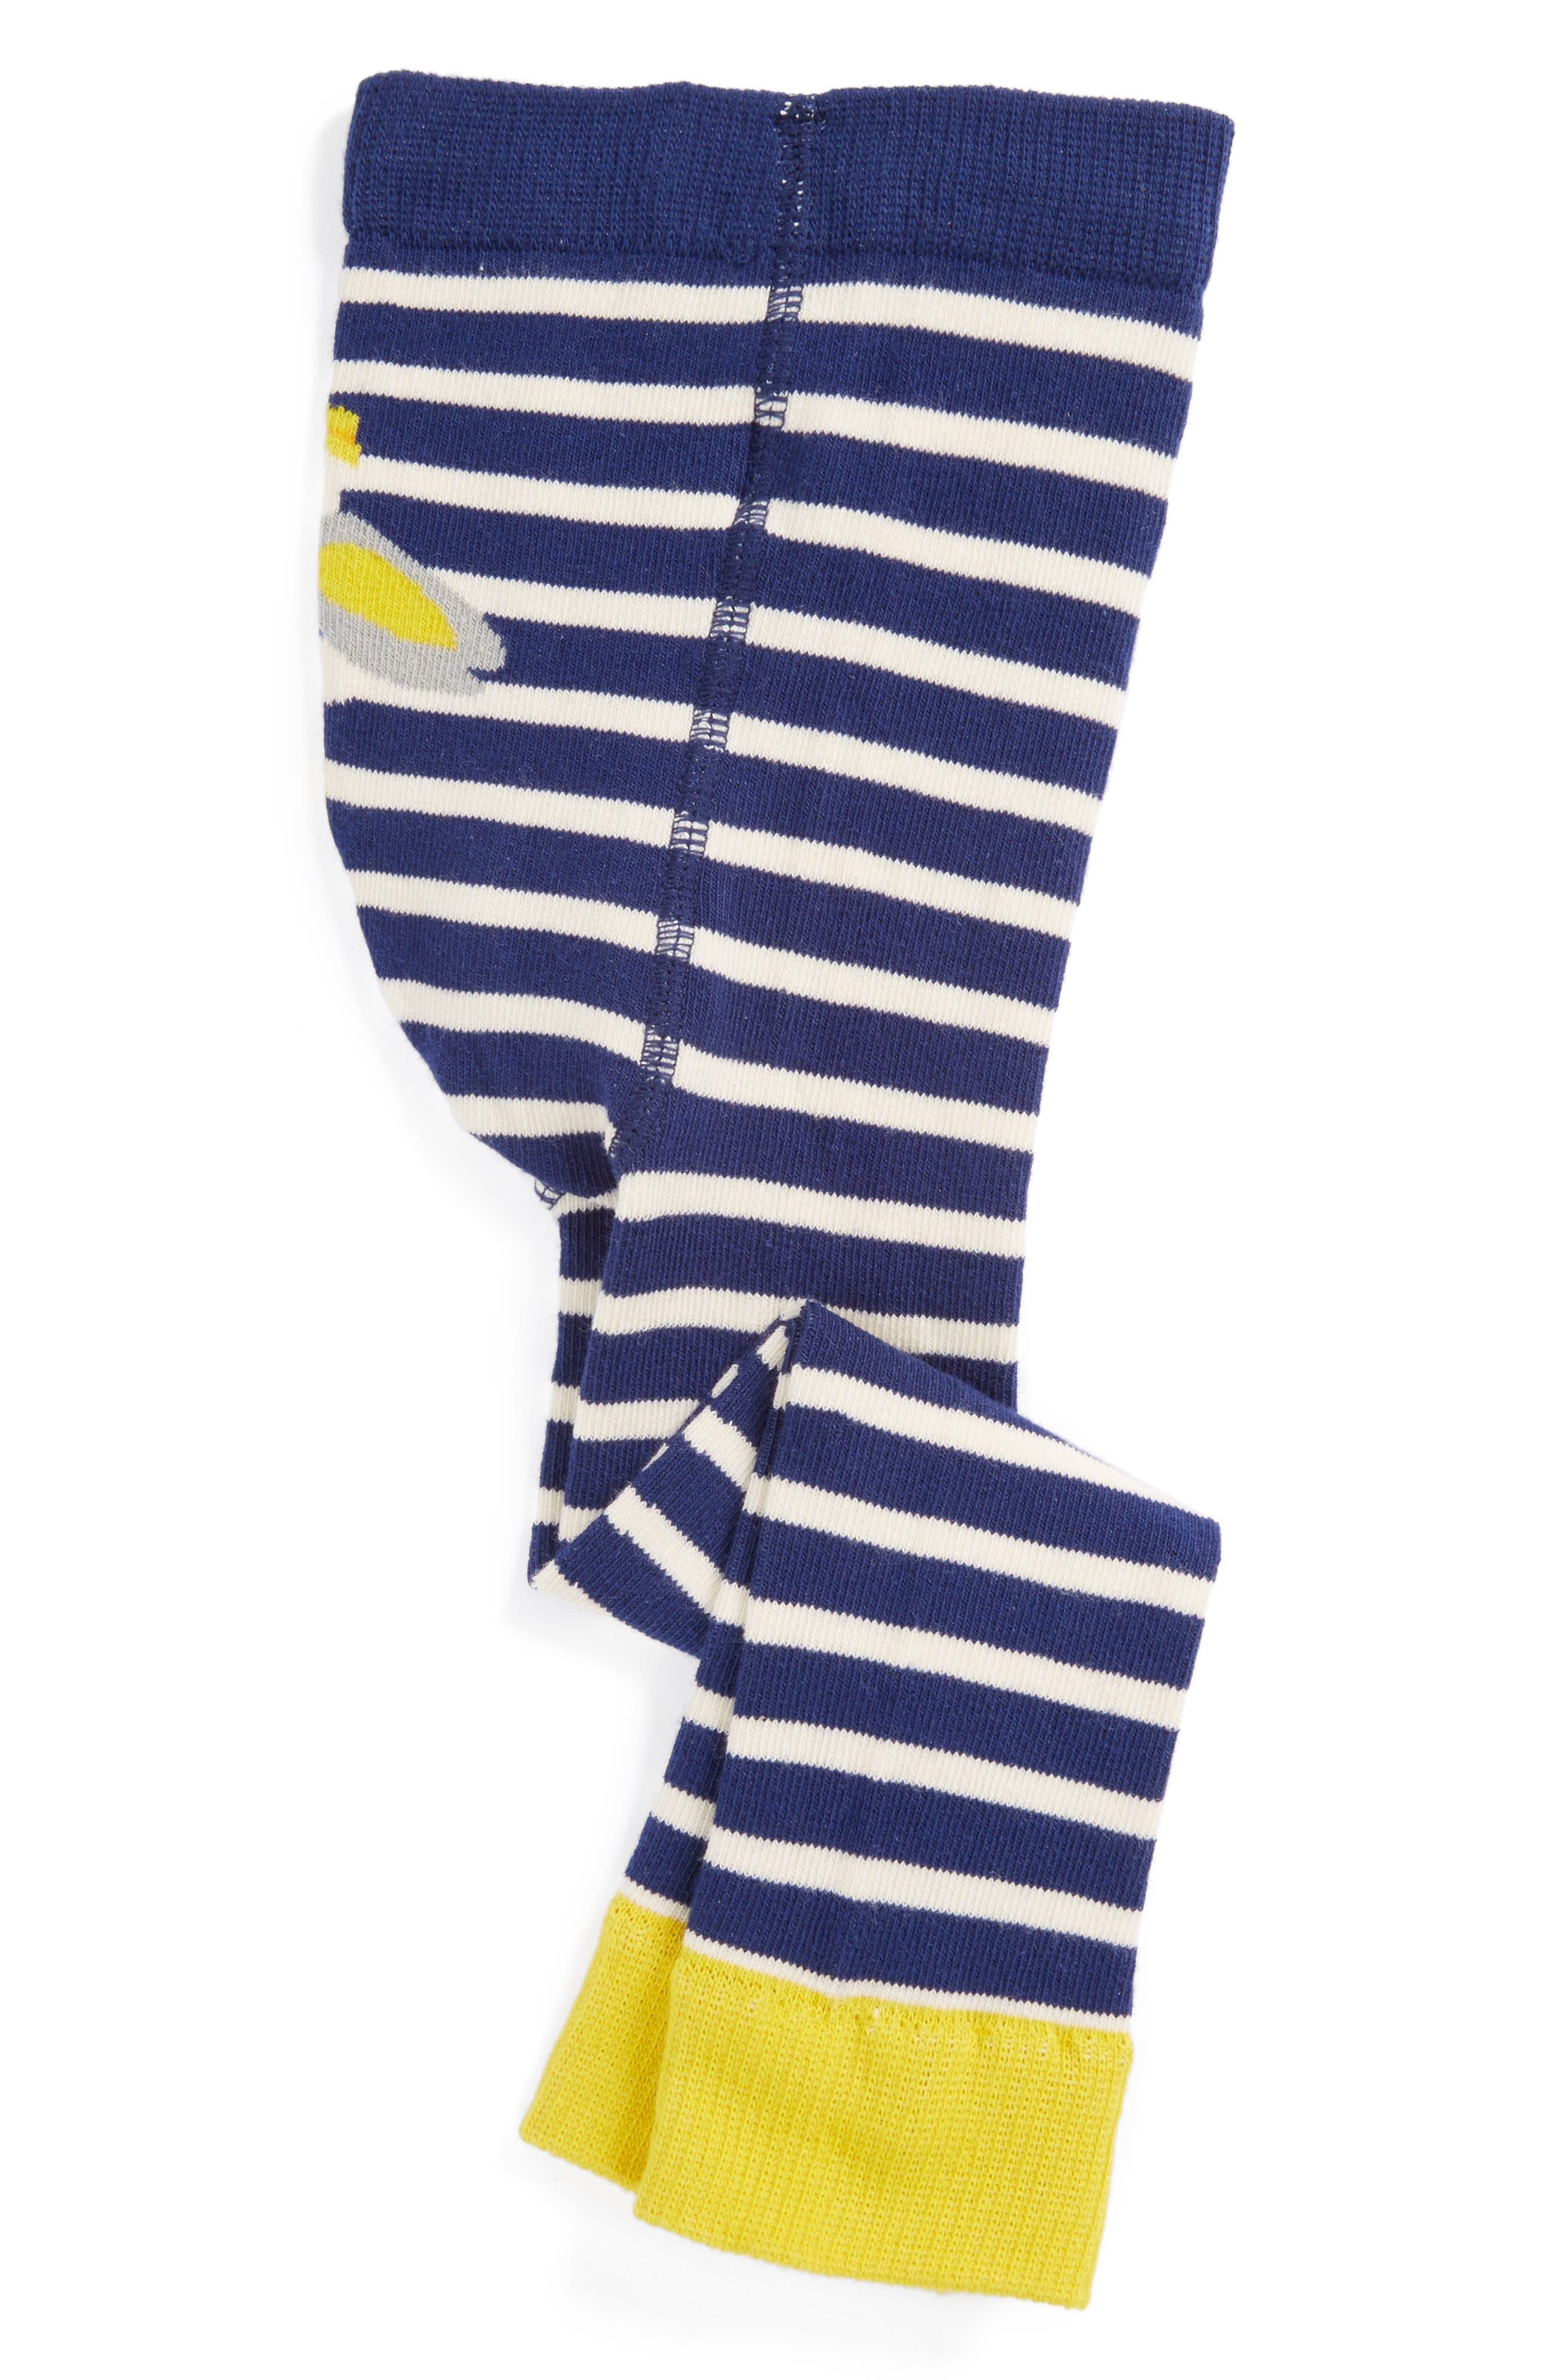 Mini Boden Intarsia Knit Leggings (Baby & Toddler)